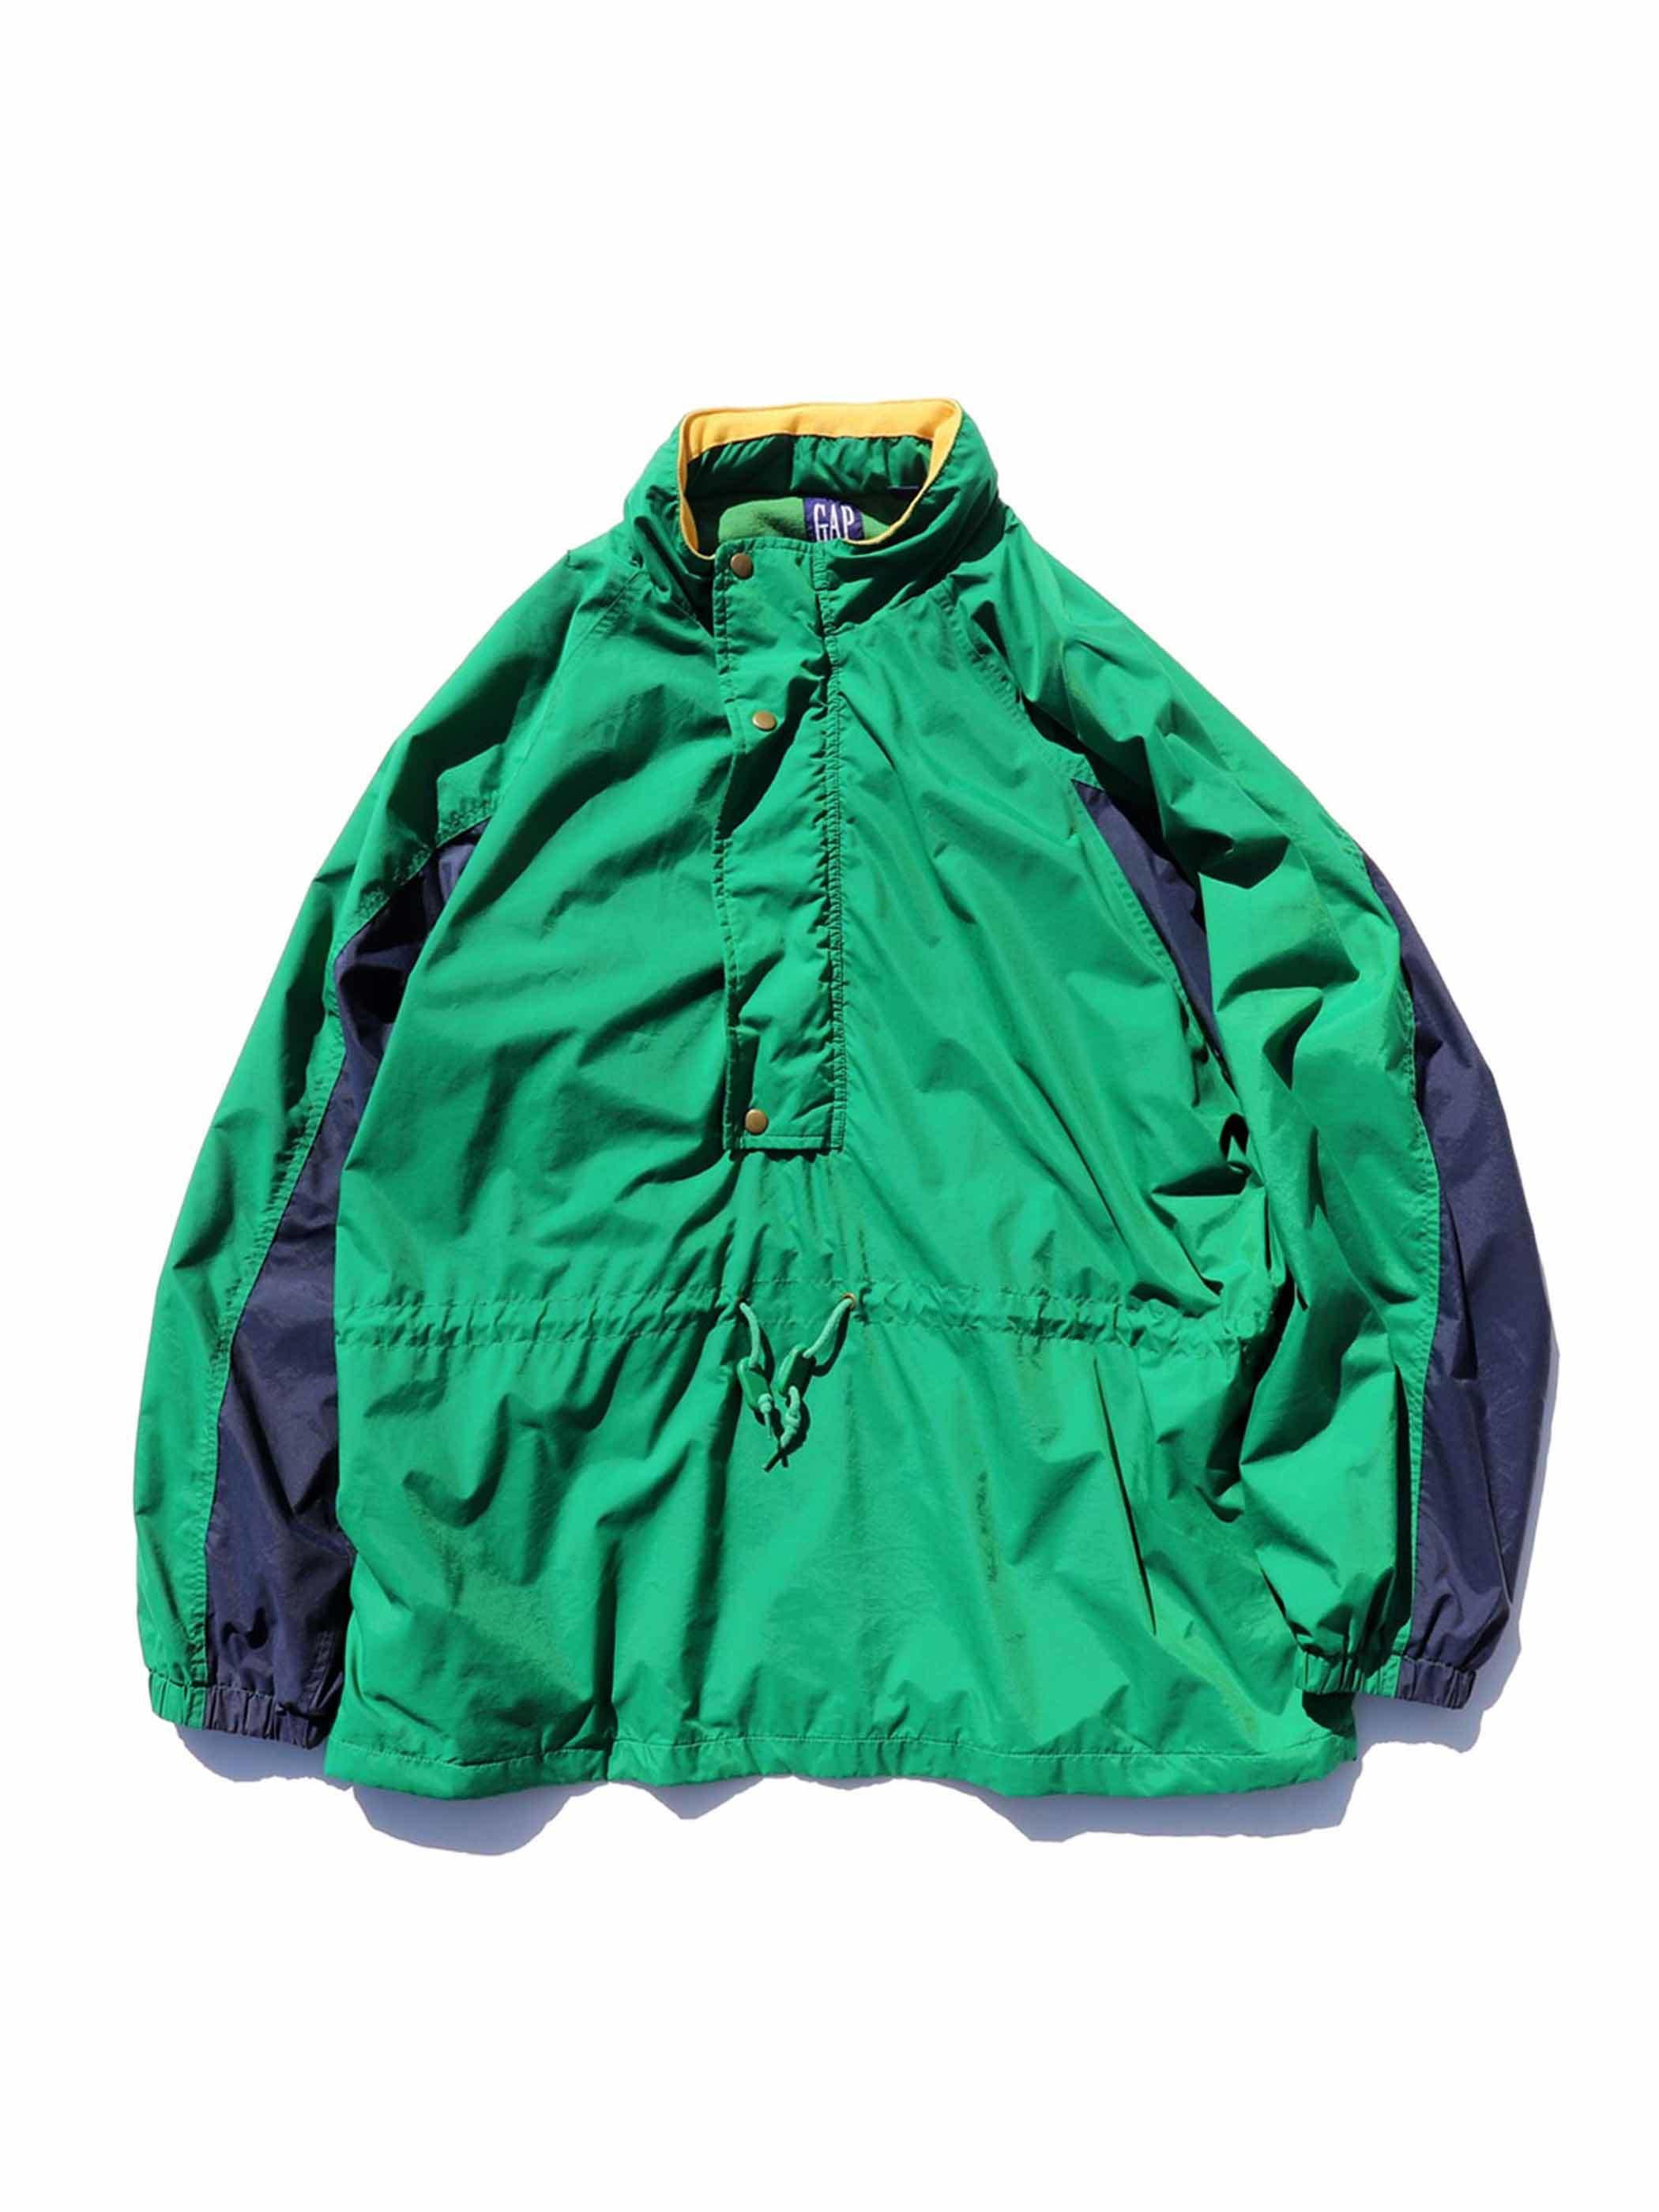 90's GAP ナイロン プルオーバージャケット [XL]